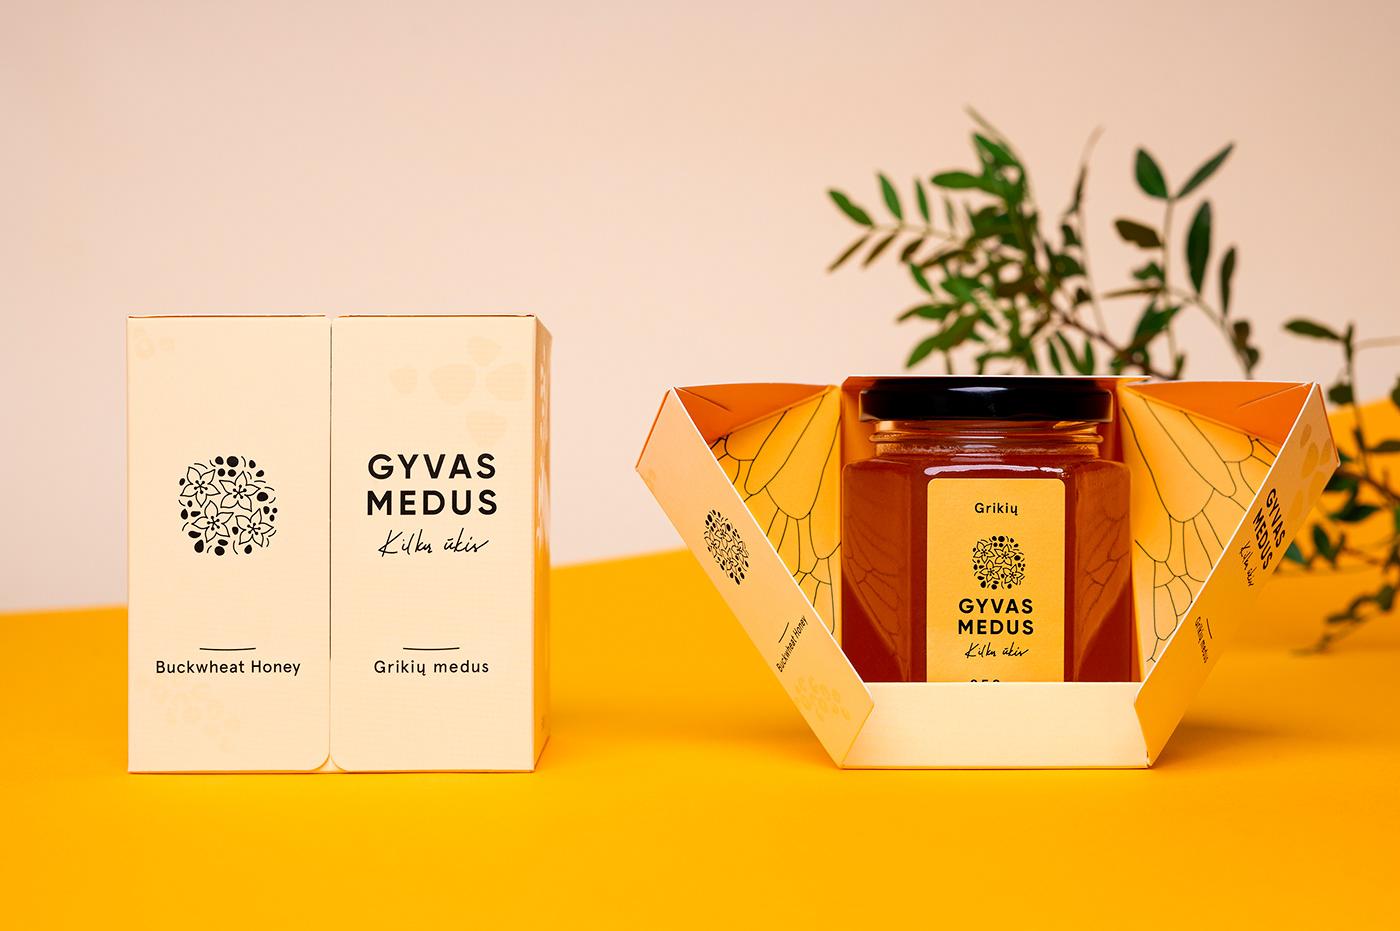 branding  dieline graphicdesign honeypackage Honeypackaging Lithuanianpackaging pacaging package packagedesign packagingdesign